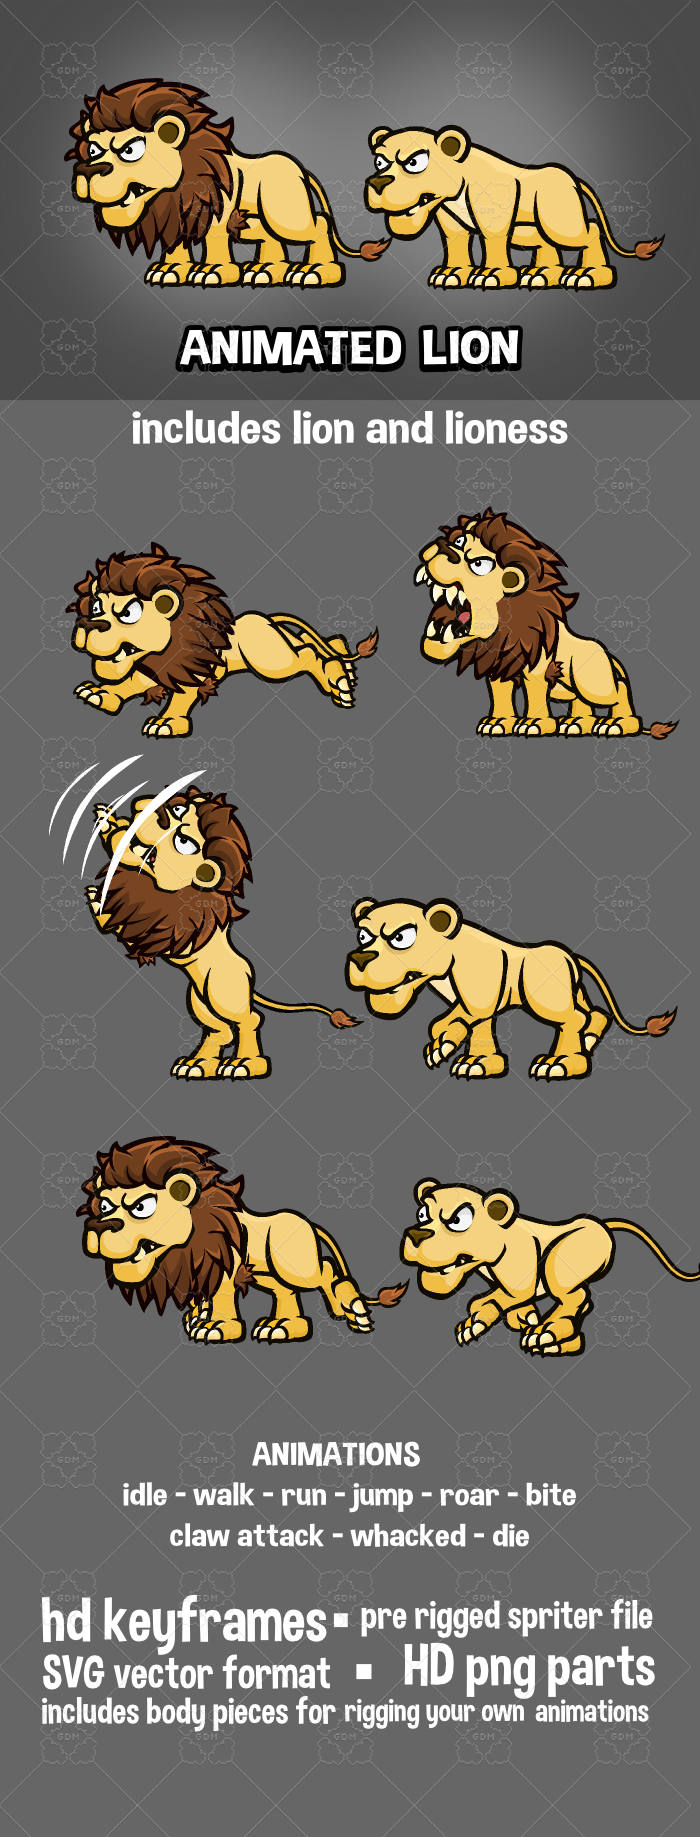 Animated lion cartoon sprite